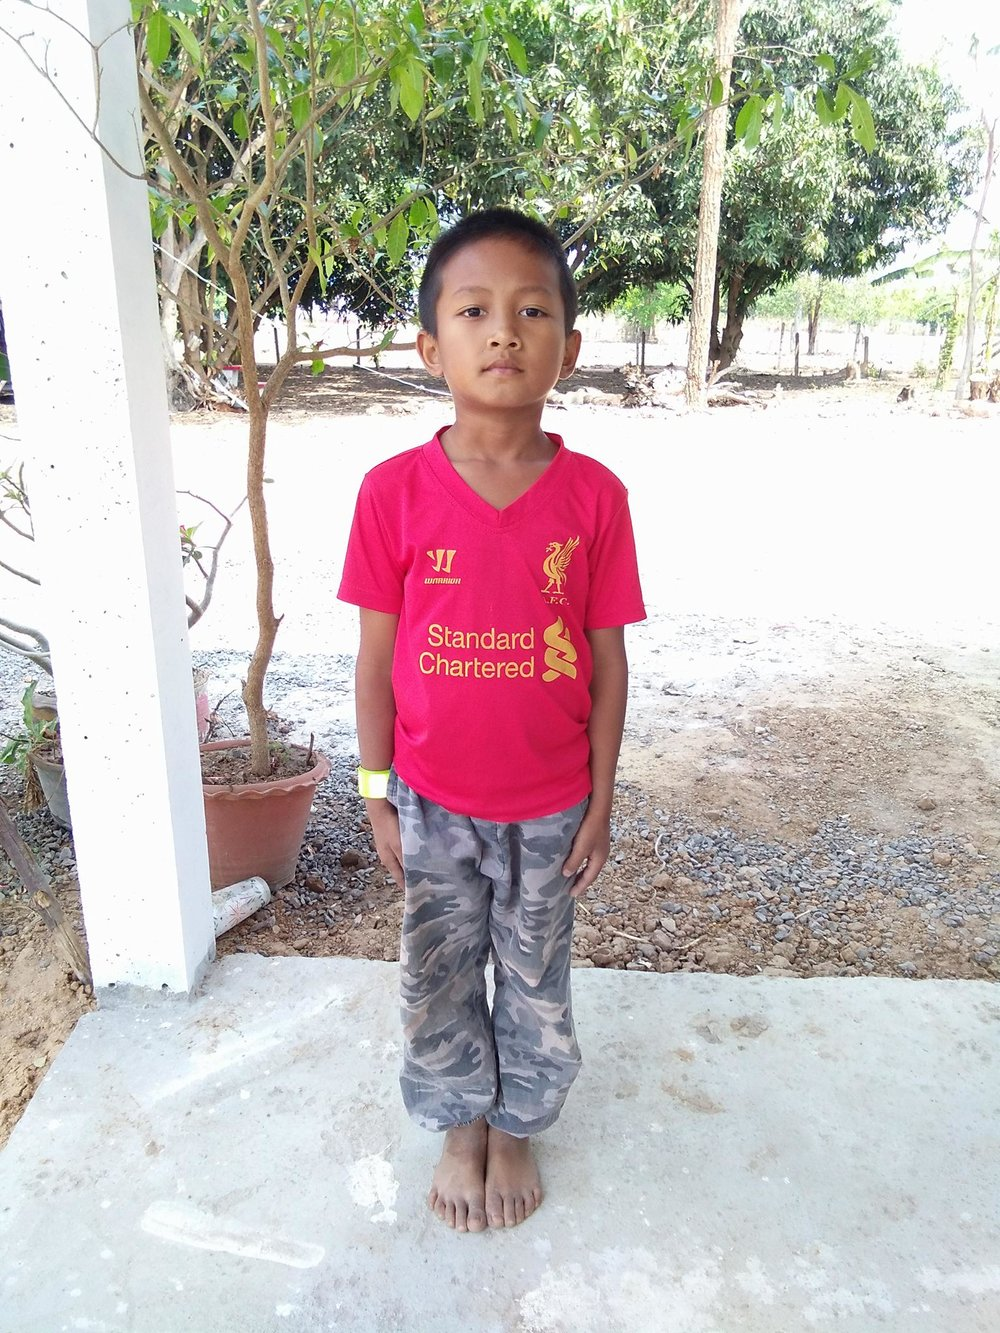 Pharteep Kewpan (9 years old, boy)